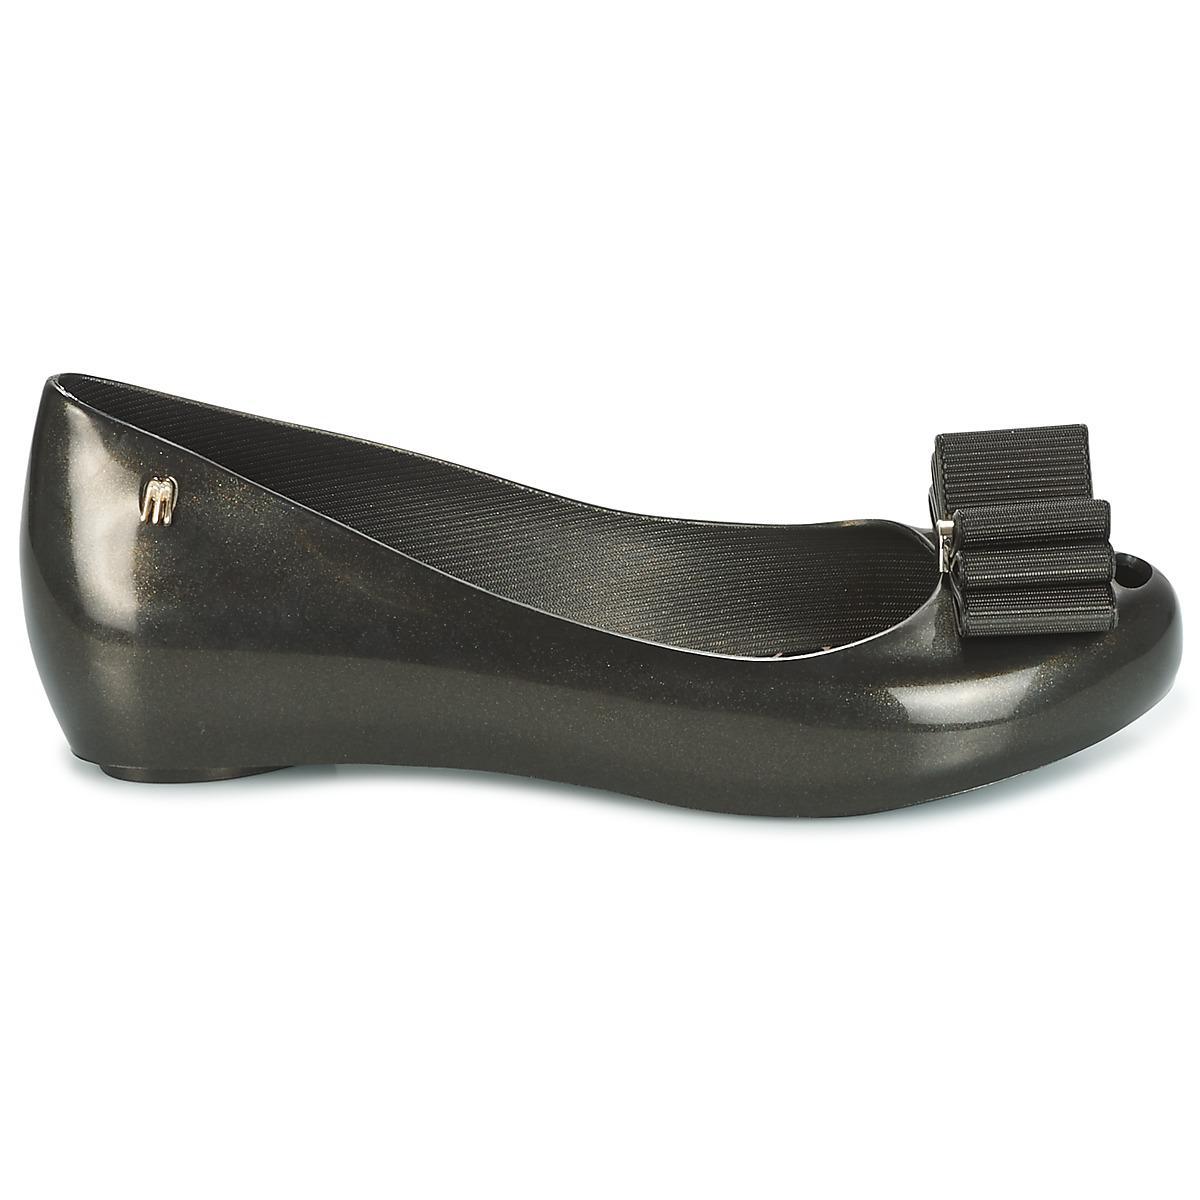 Melissa   Jwu Ultragirl Sweet Black Women s Shoes trainers In Black    Lyst View Fullscreen